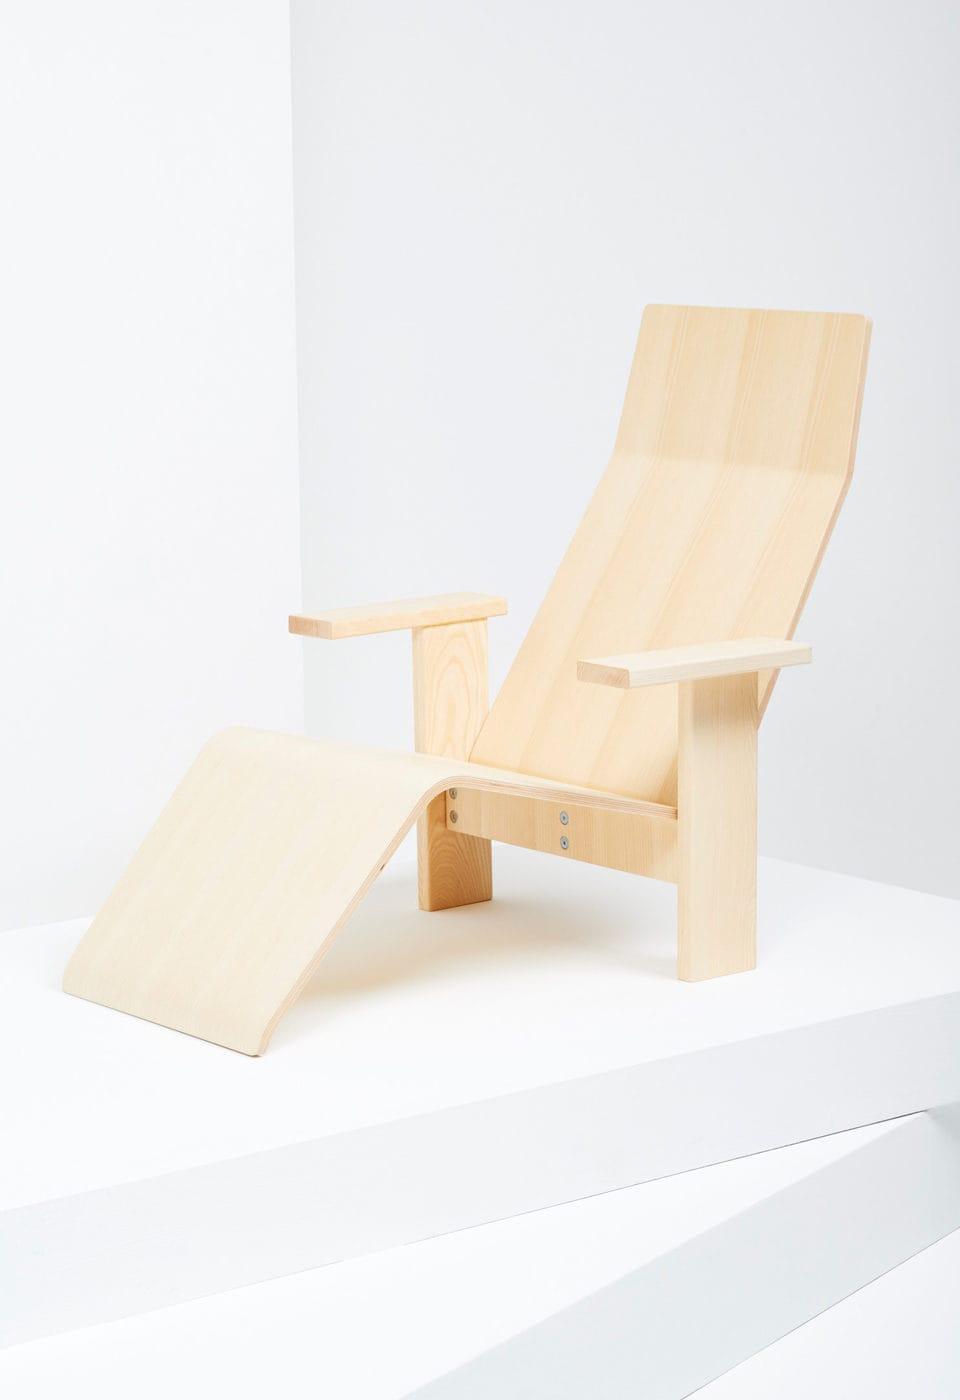 mc15 quindici collection mattiazzi. Black Bedroom Furniture Sets. Home Design Ideas